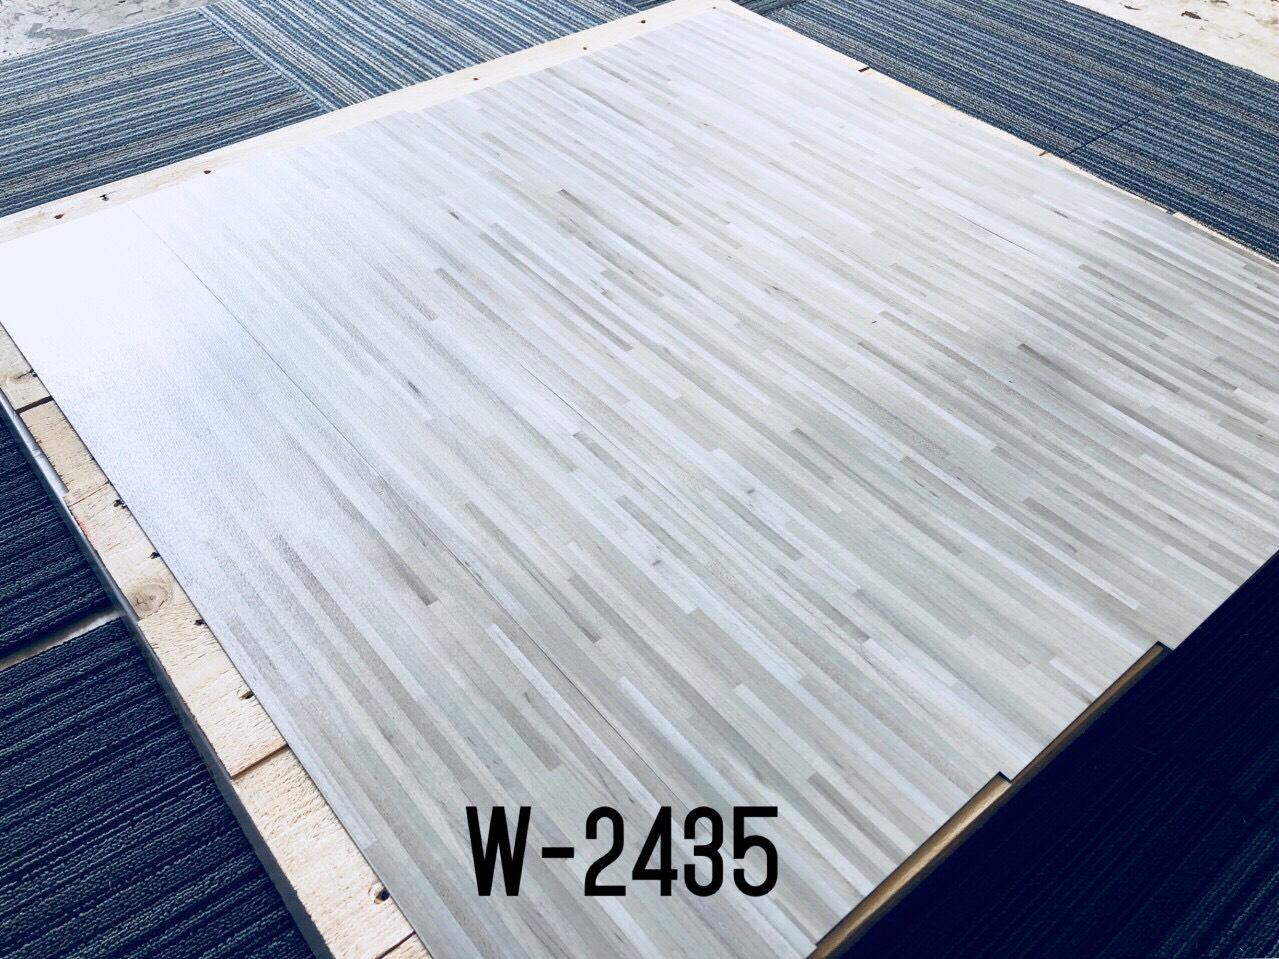 Sàn nhựa vân gỗ Nanolife 3mm W2435